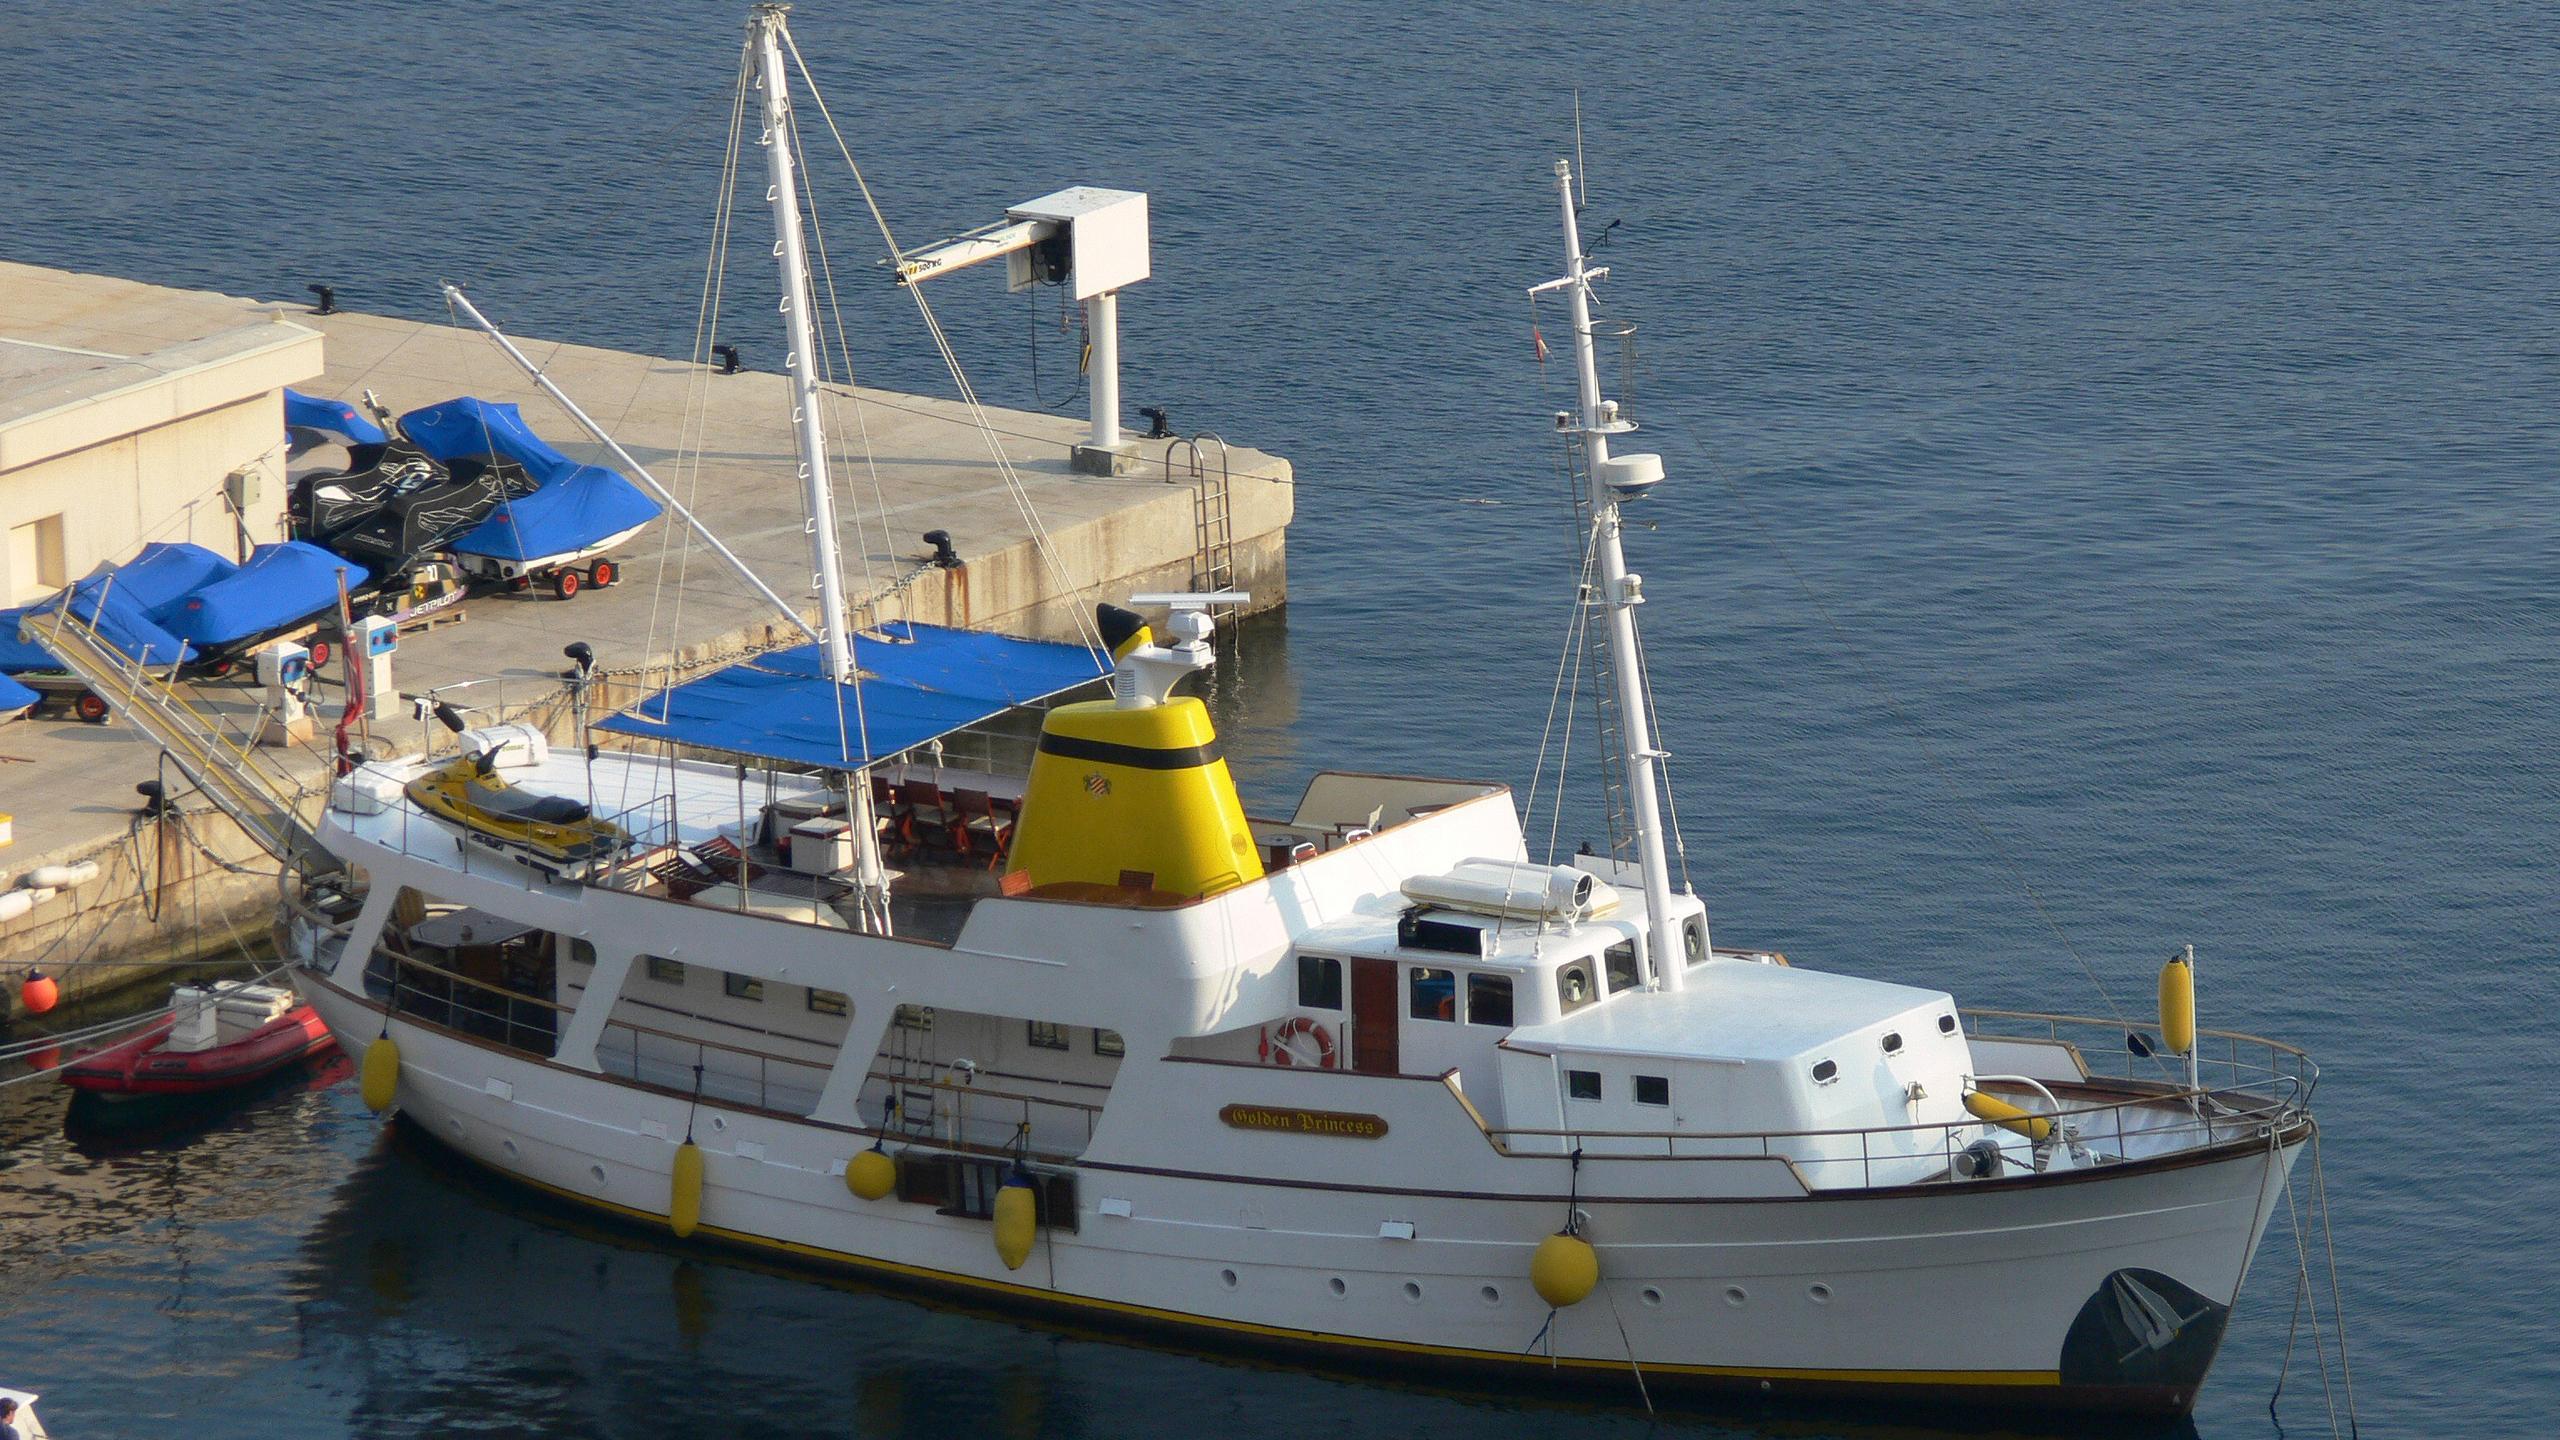 golden-princess-classic-motor-yacht-normandie-1966-26m-aerial